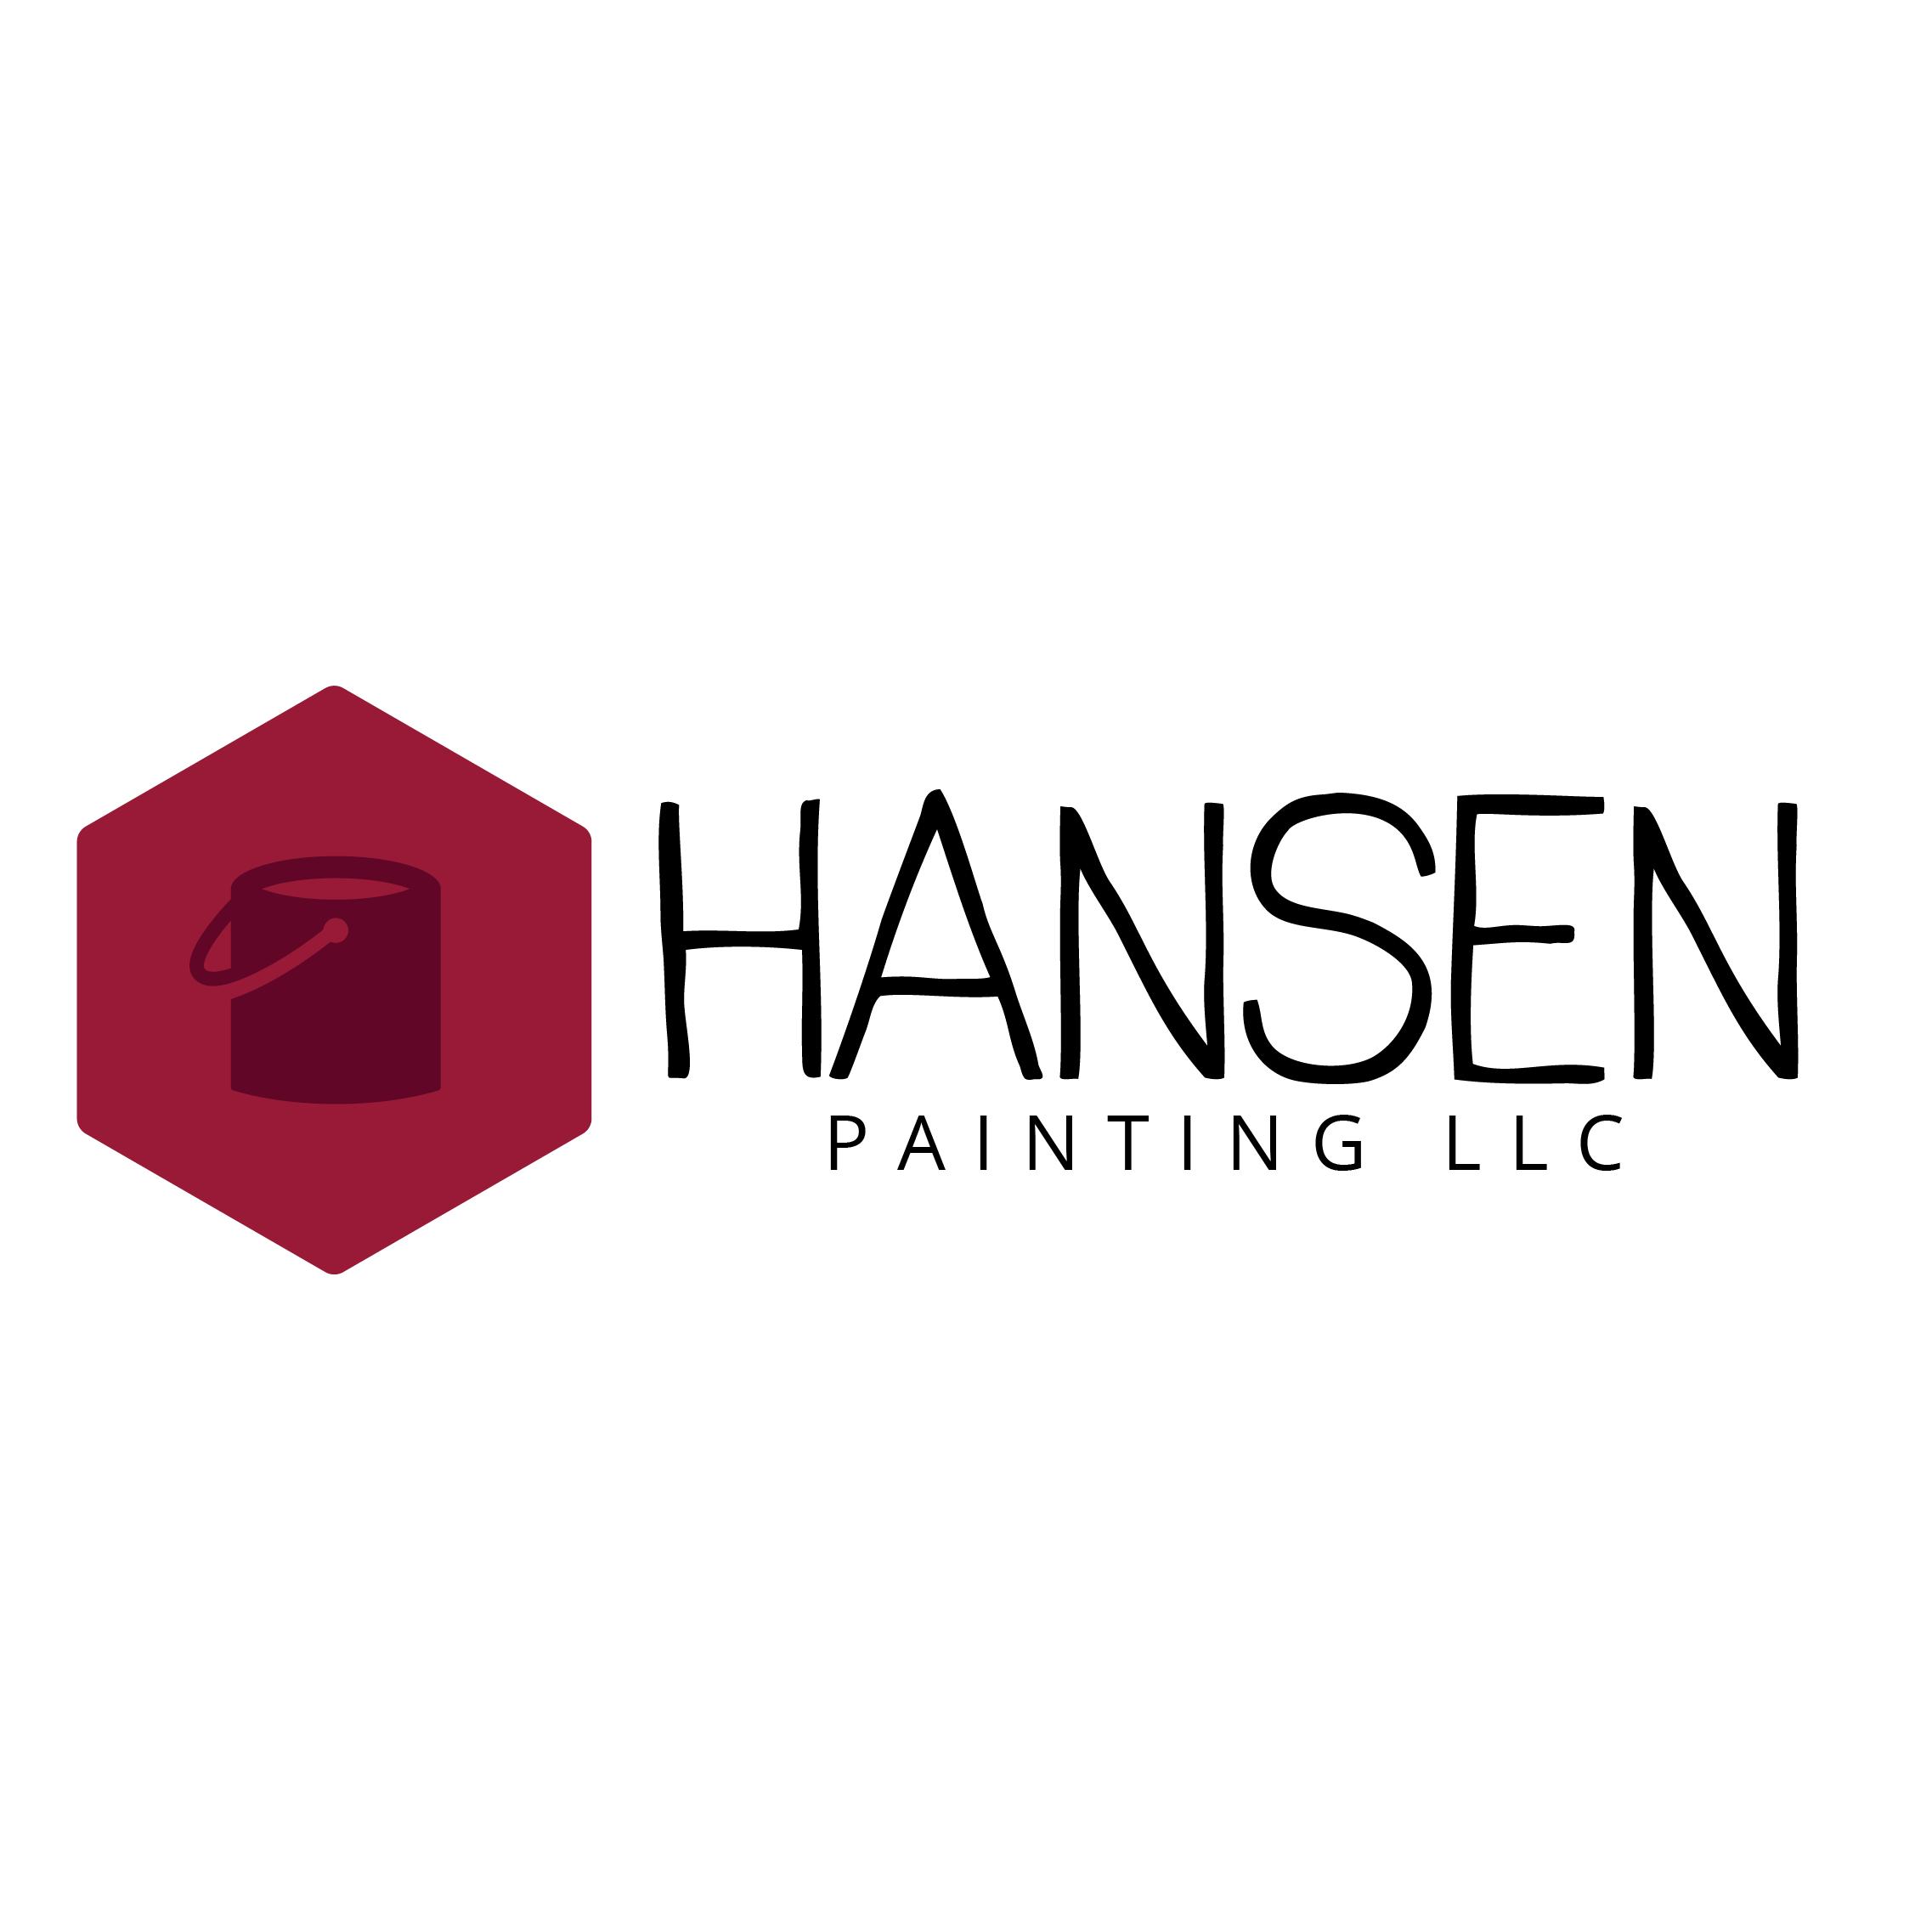 Hansen Painting LLC - Troy, NY 12180 - (518)369-0563   ShowMeLocal.com